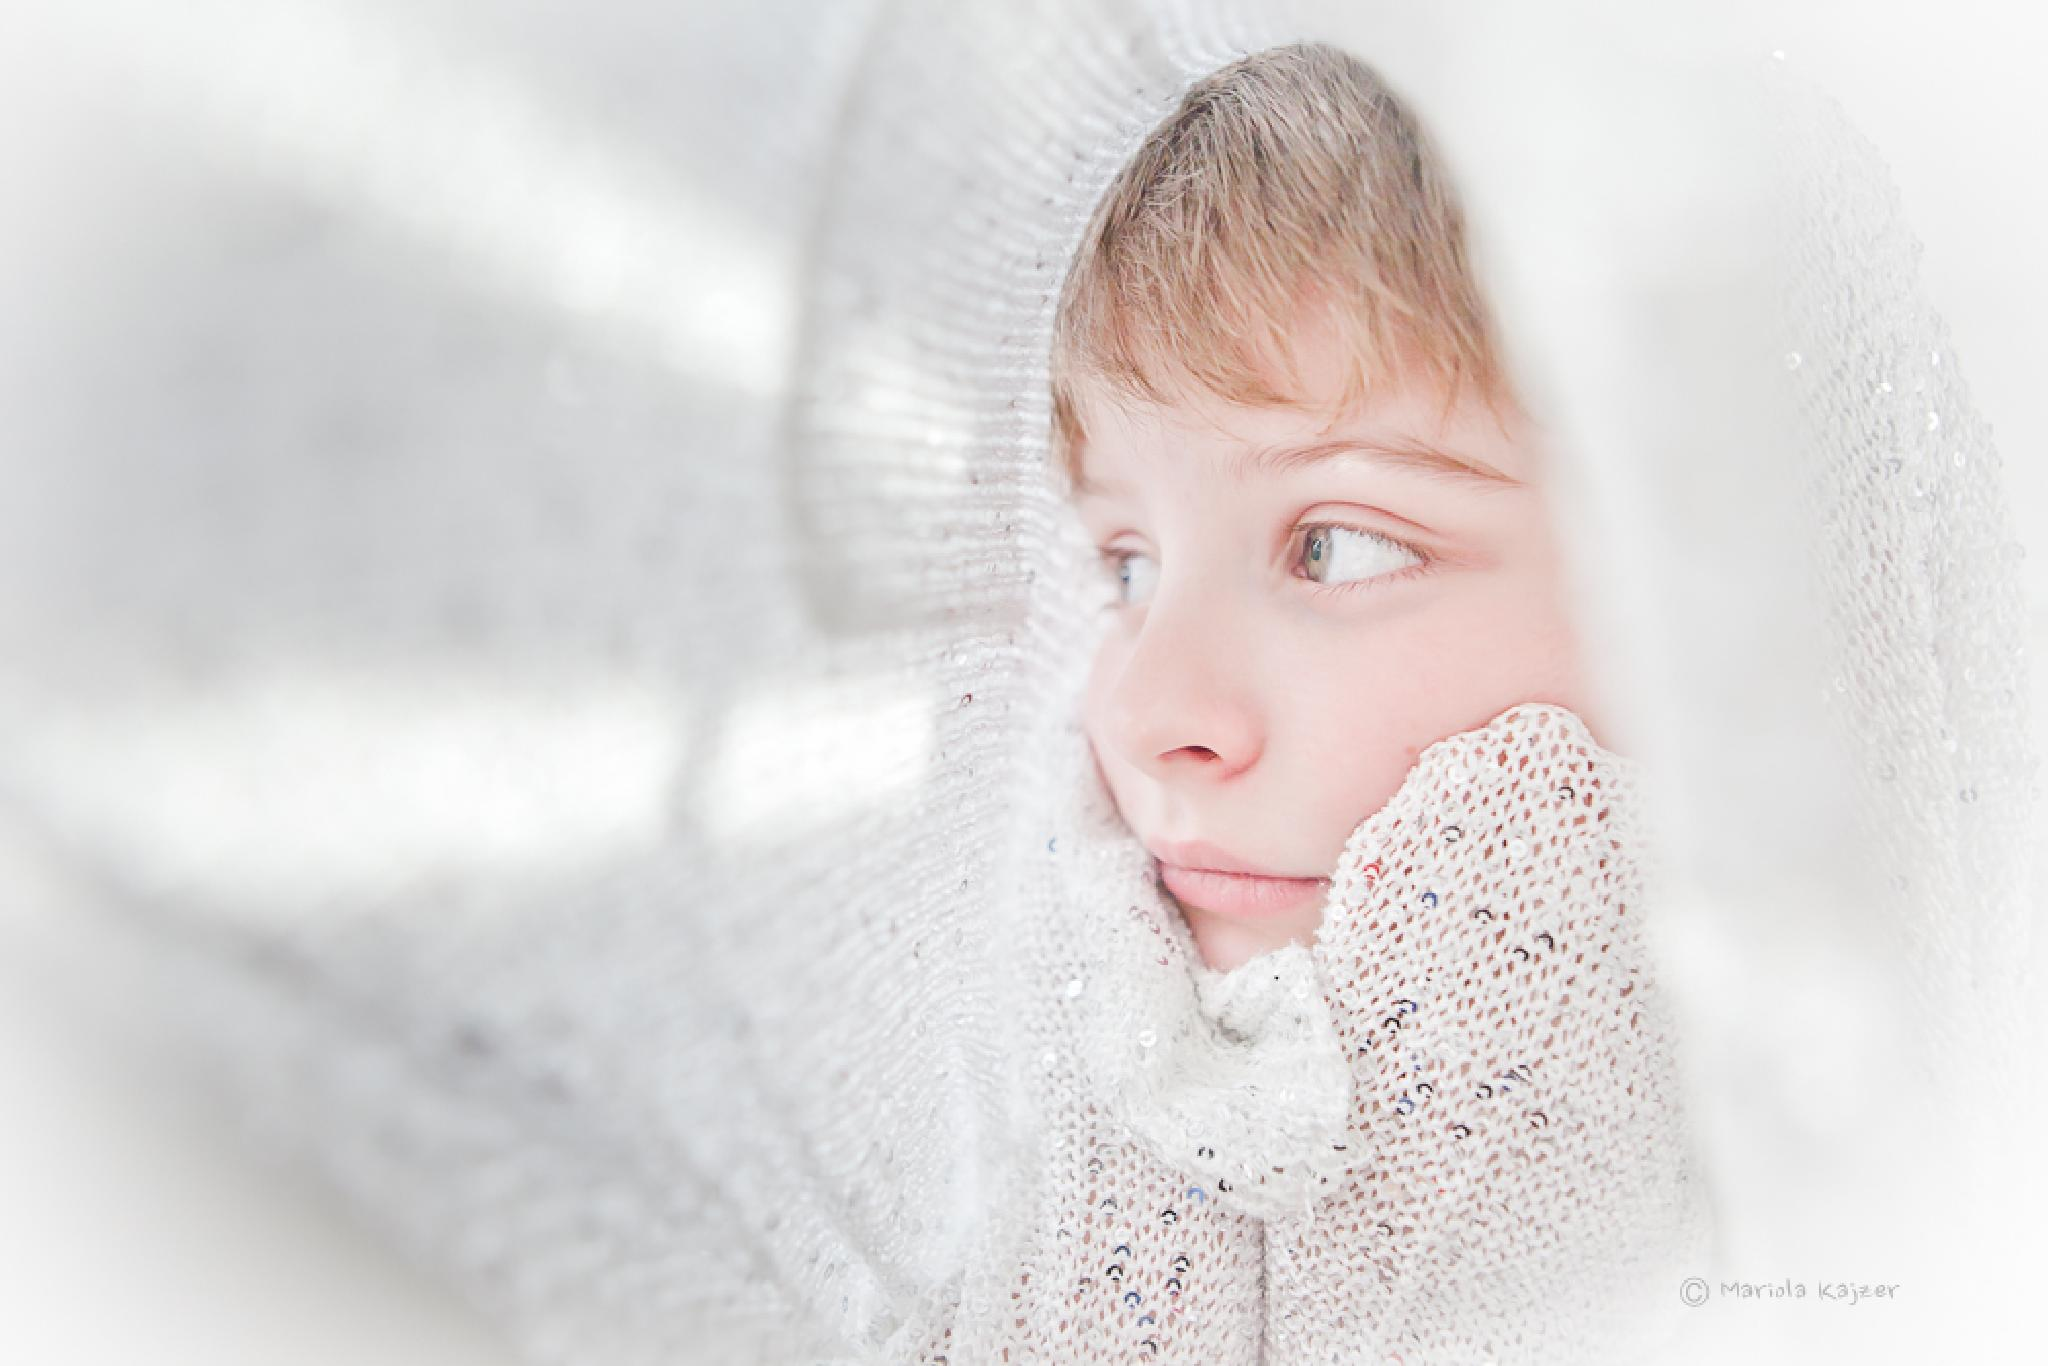 cold dream by mariola.kajzer.1